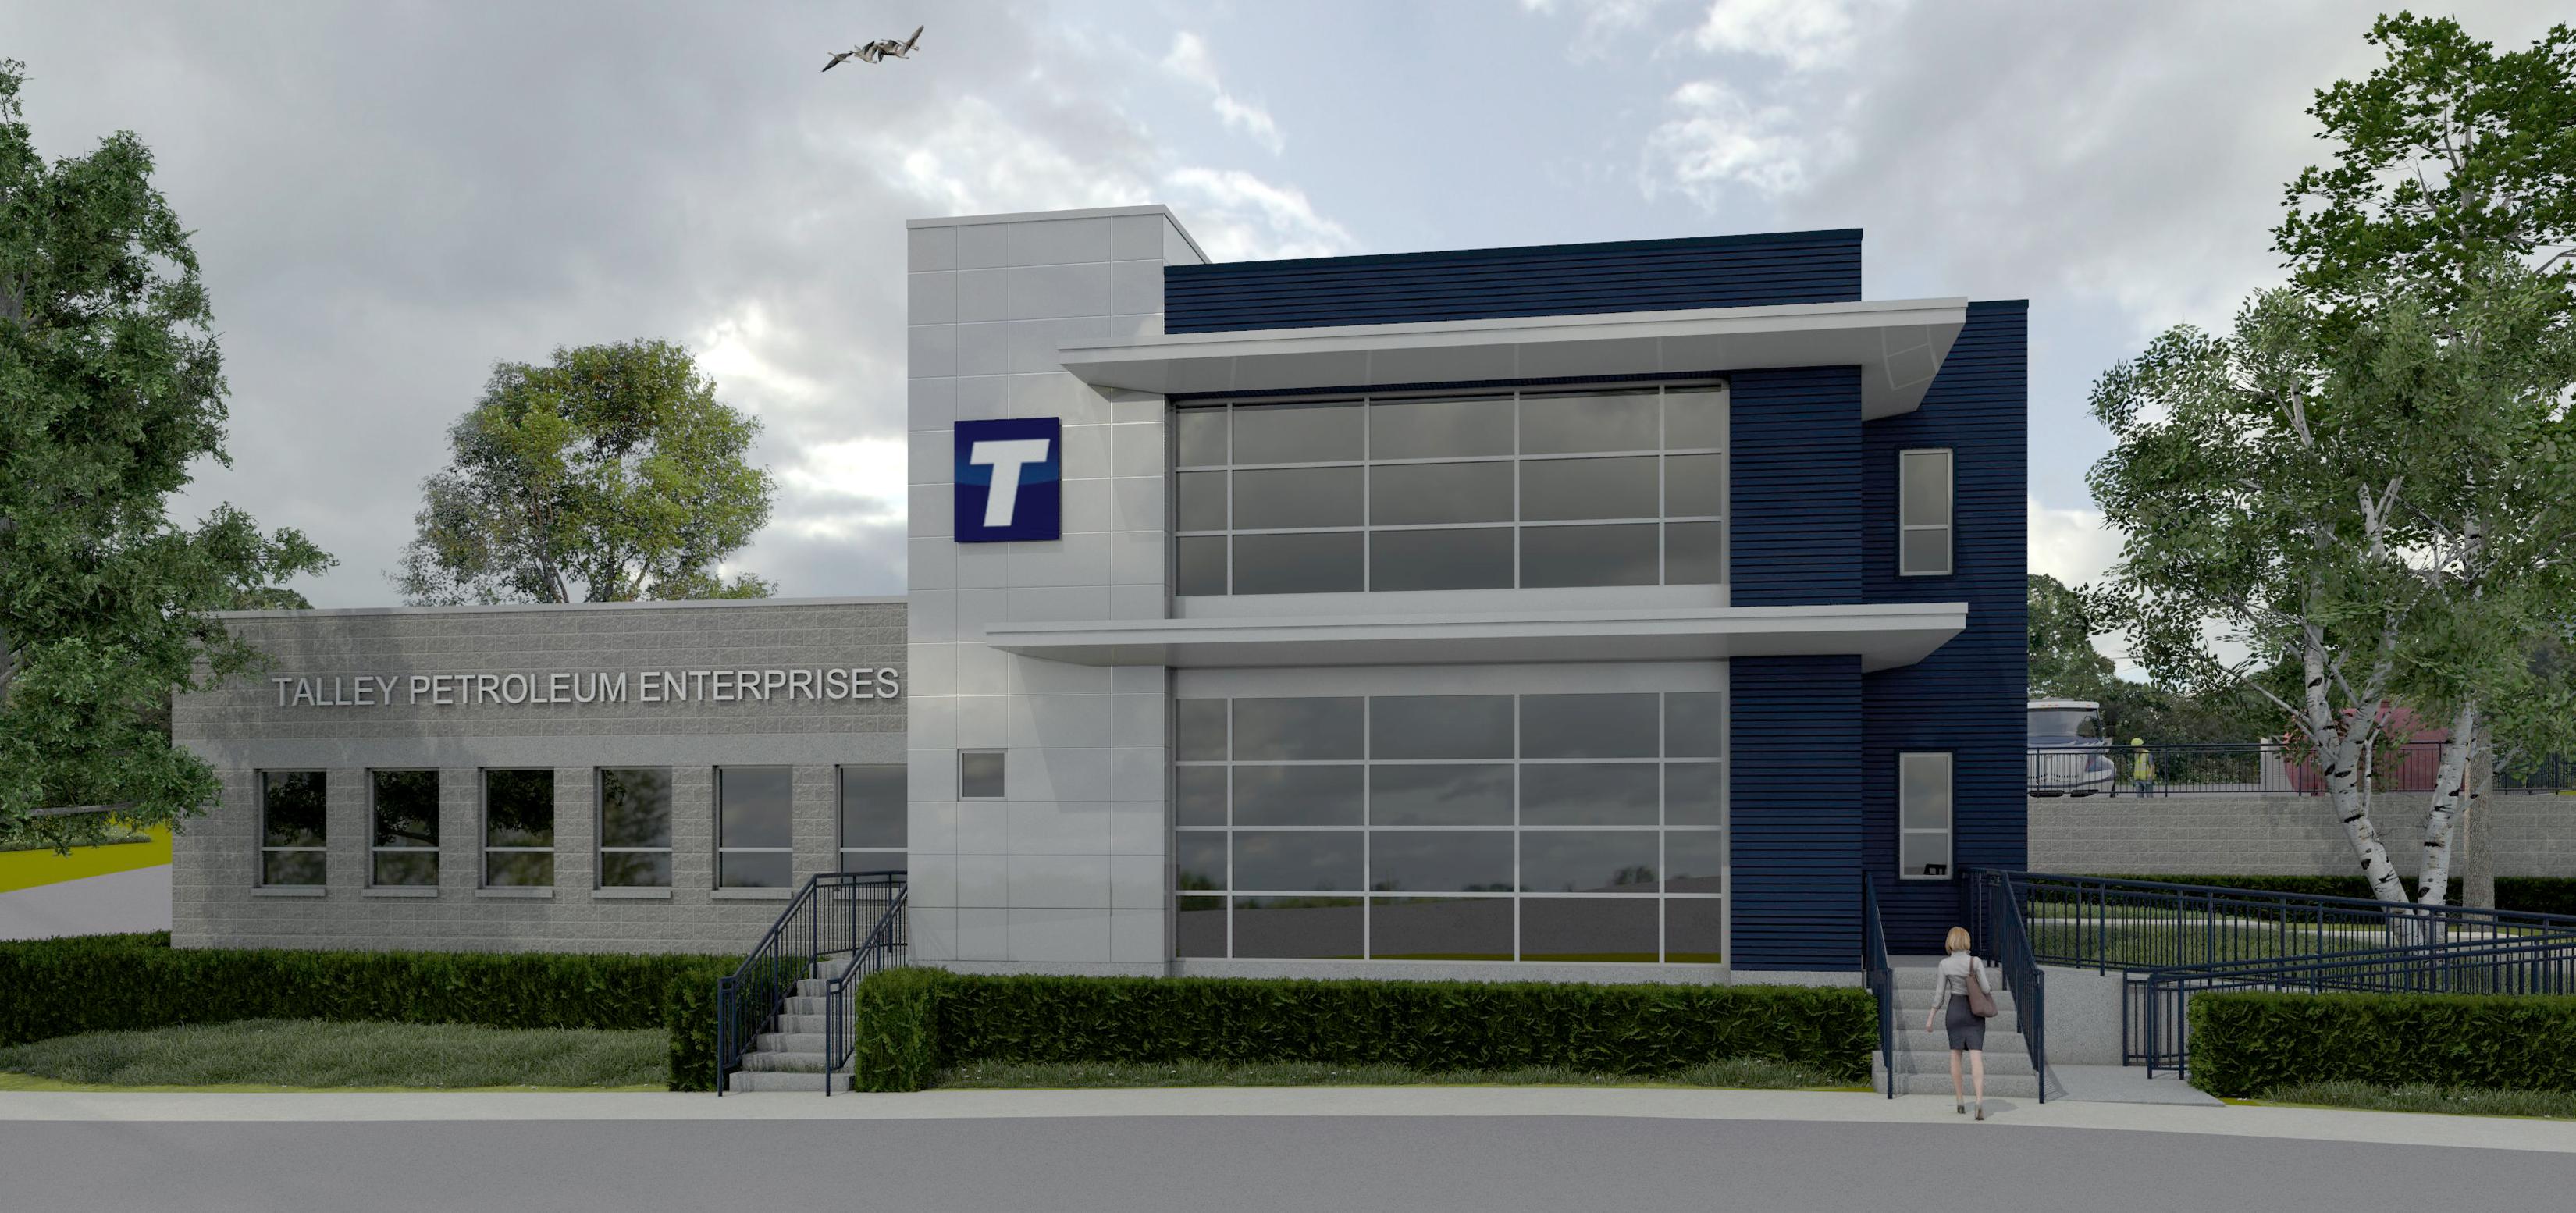 TPE Corporate Headquarters